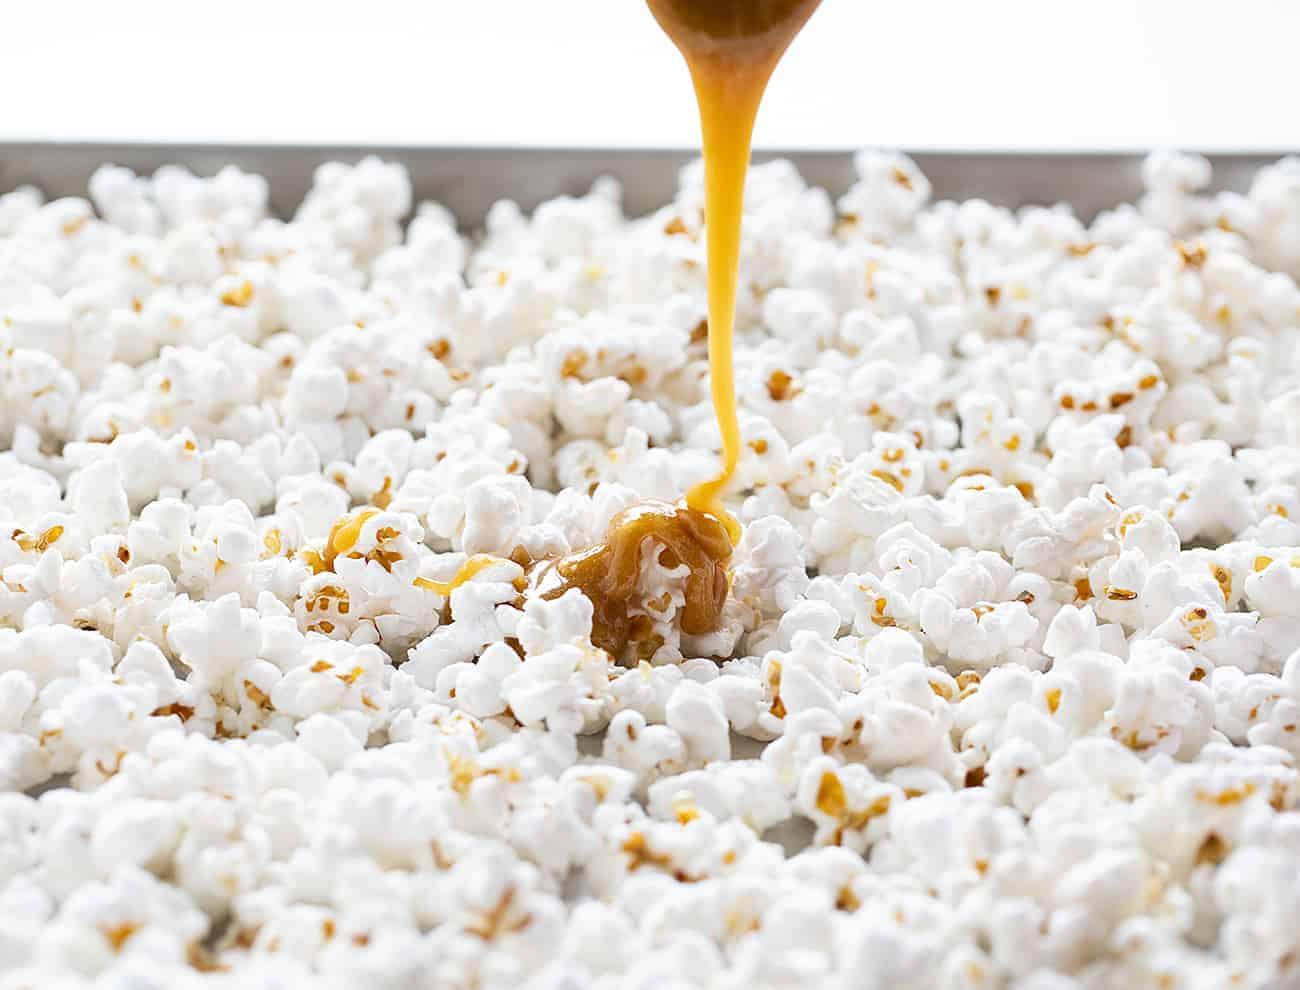 Pouring caramel over popcorn to make Caramel Corn